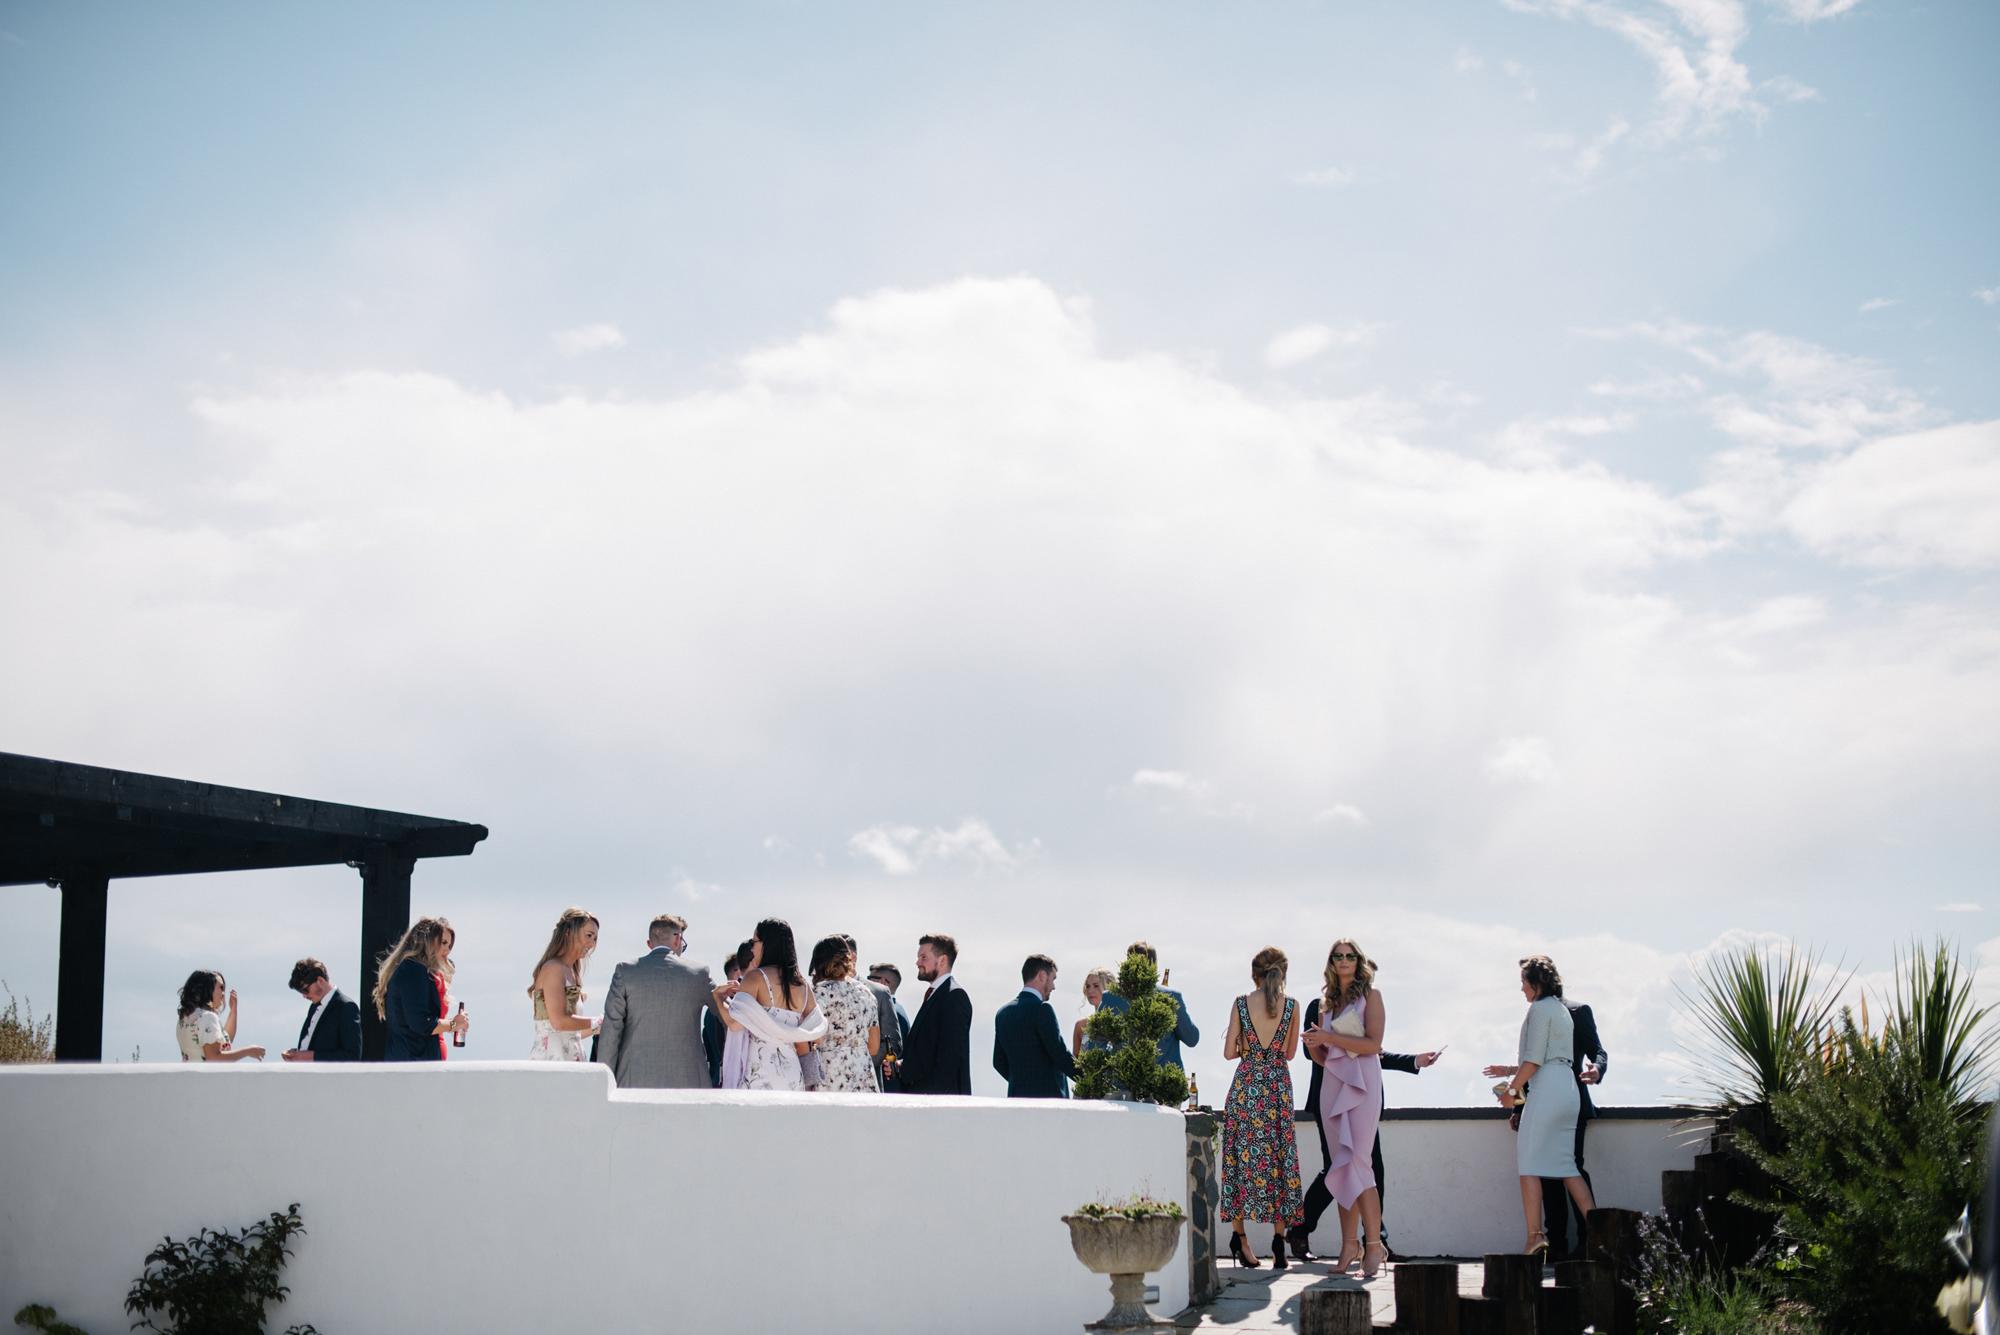 Orange_tree_house_Wedding_you_them_us_inspire_Weddings_19.jpg